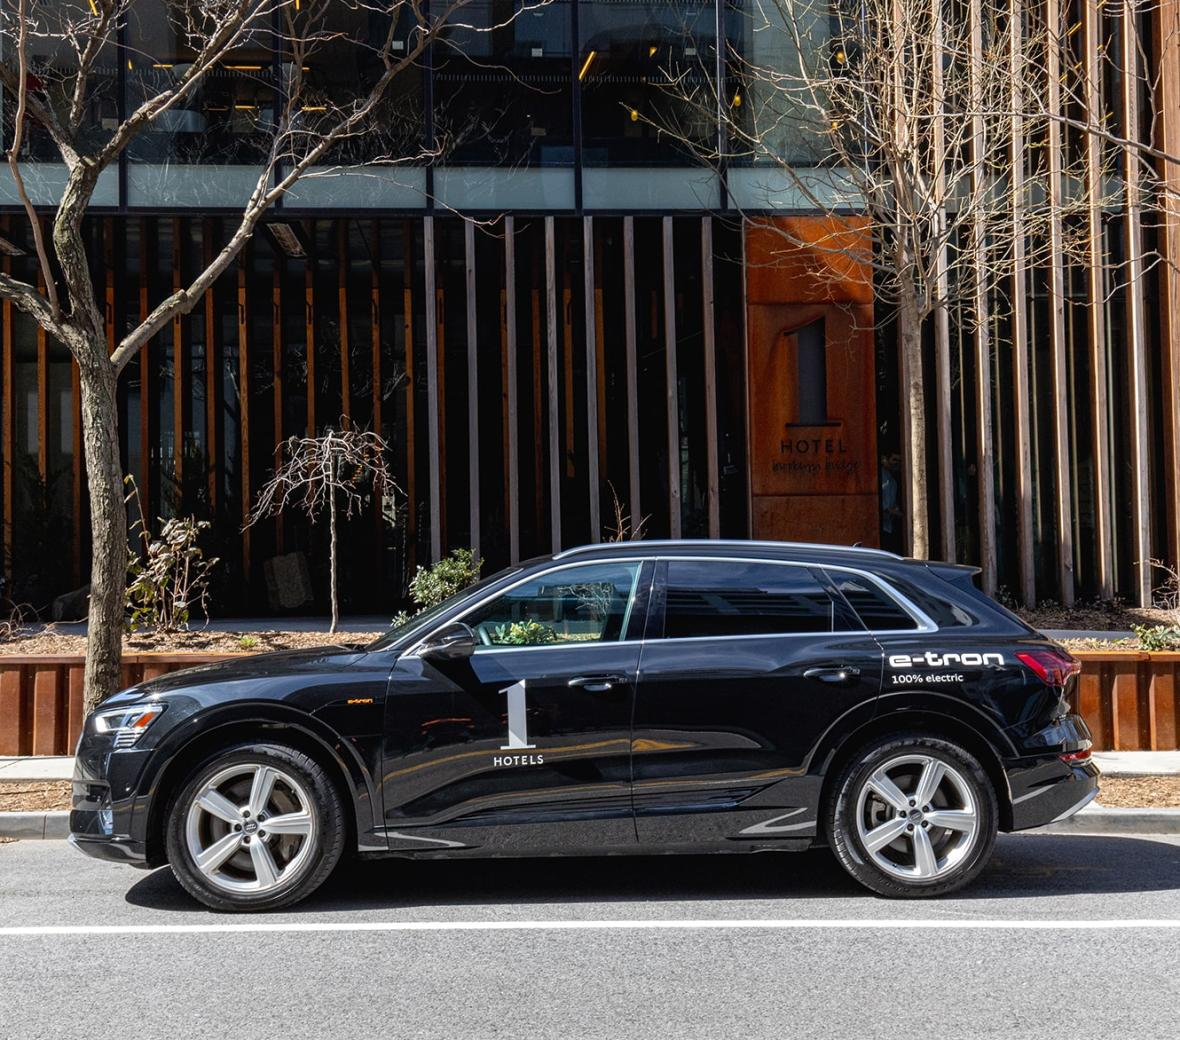 Audi Etron at 1 Hotel Brooklyn Bridge